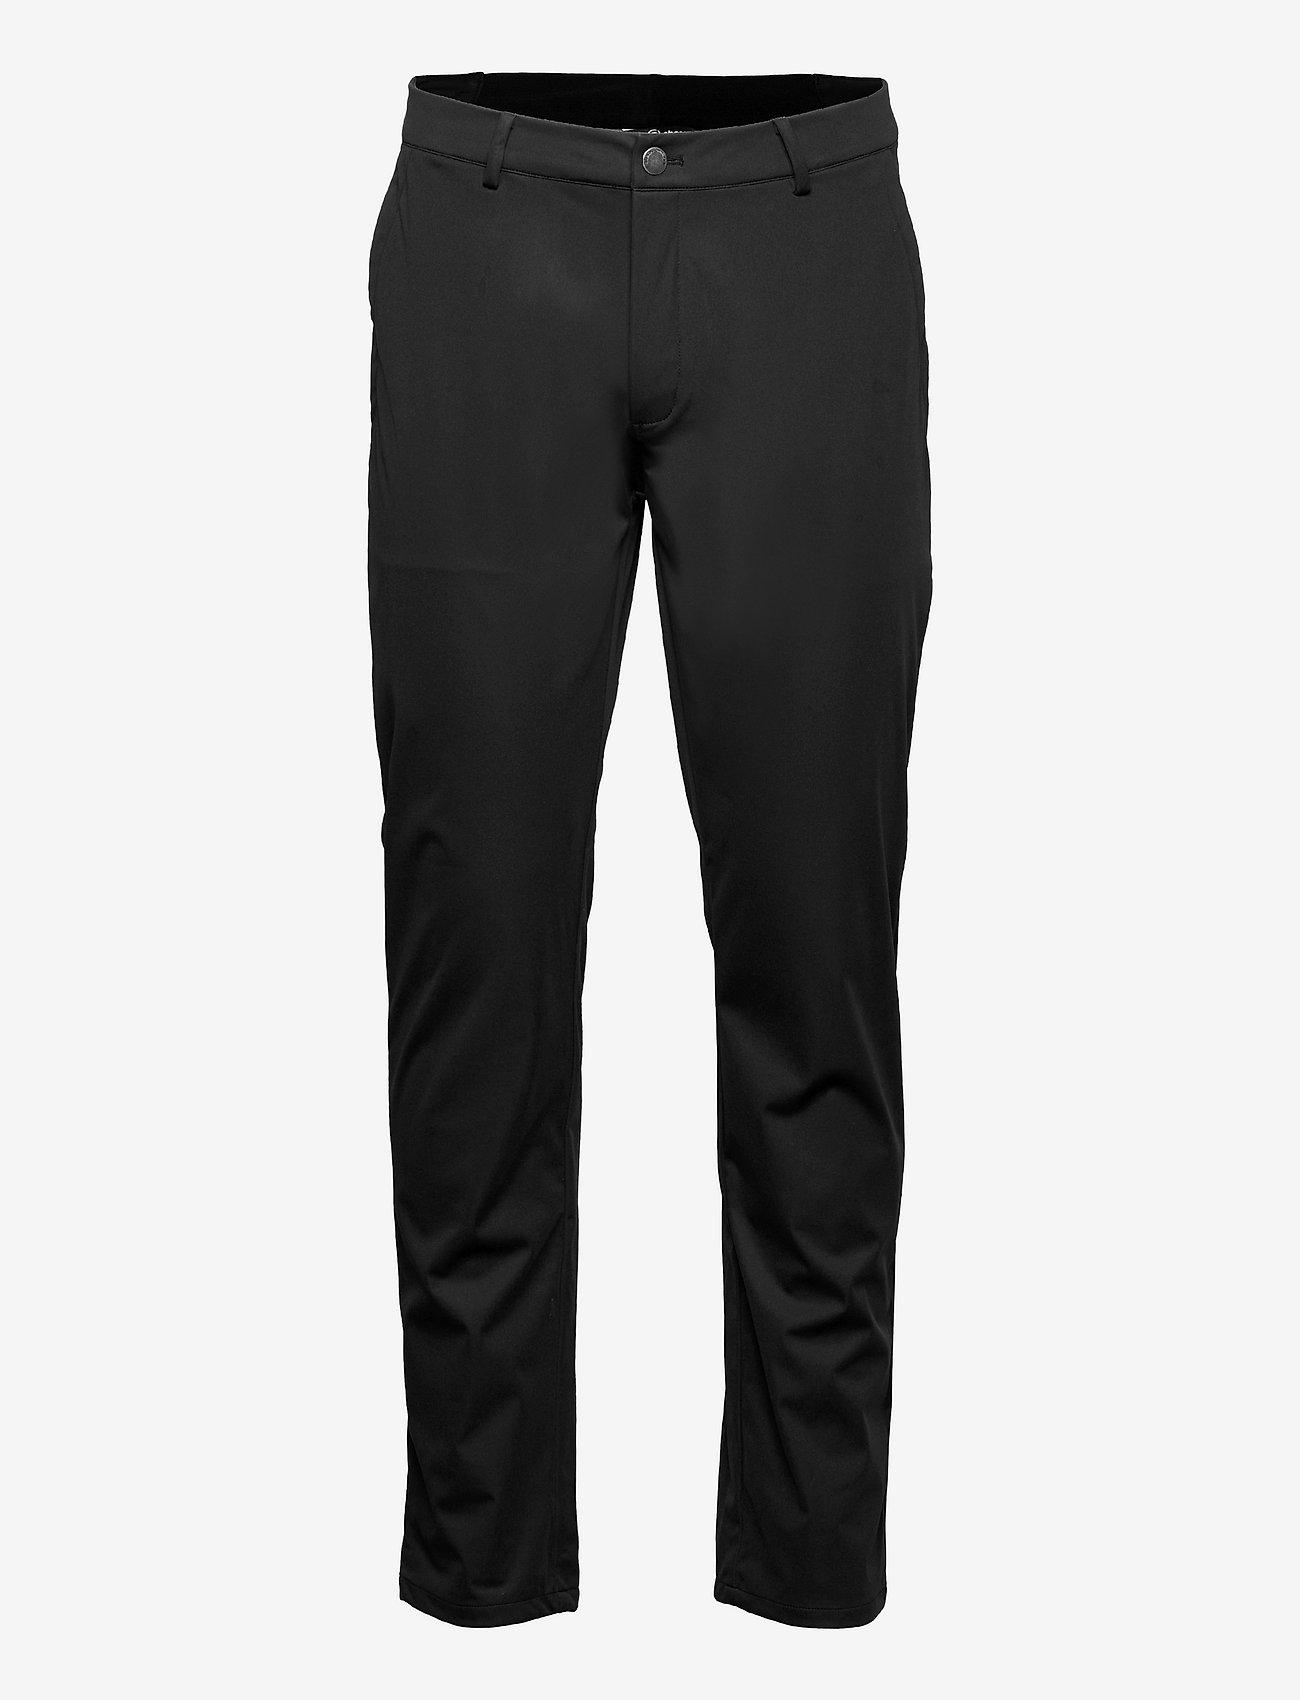 Abacus - Mens Tralee trousers - pantalon de golf - black - 0